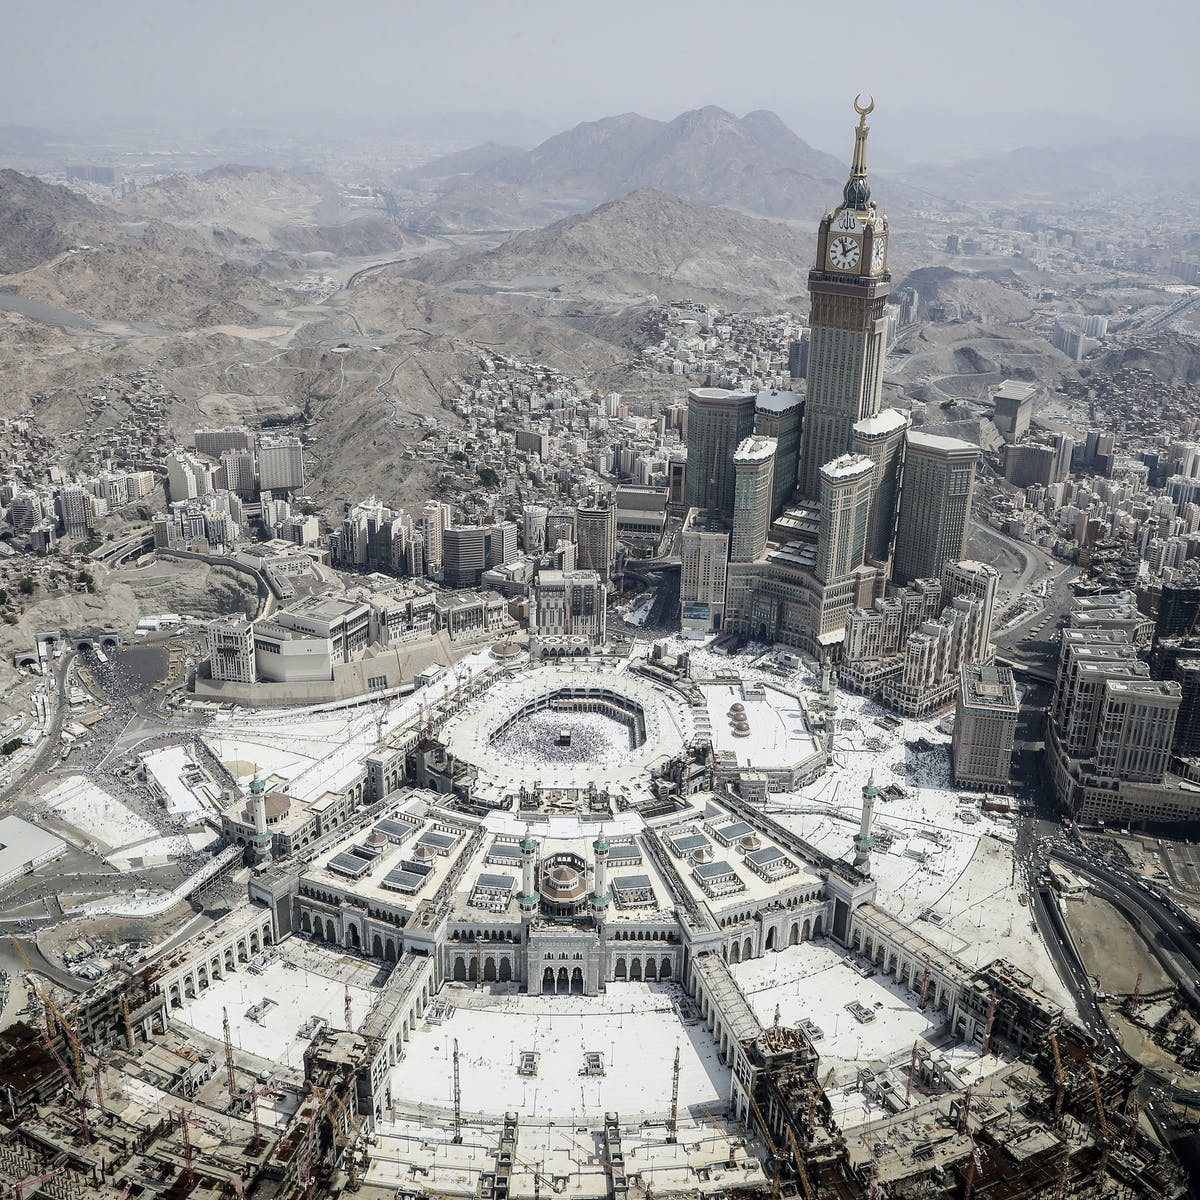 Hajj: how globalisation transformed the market for